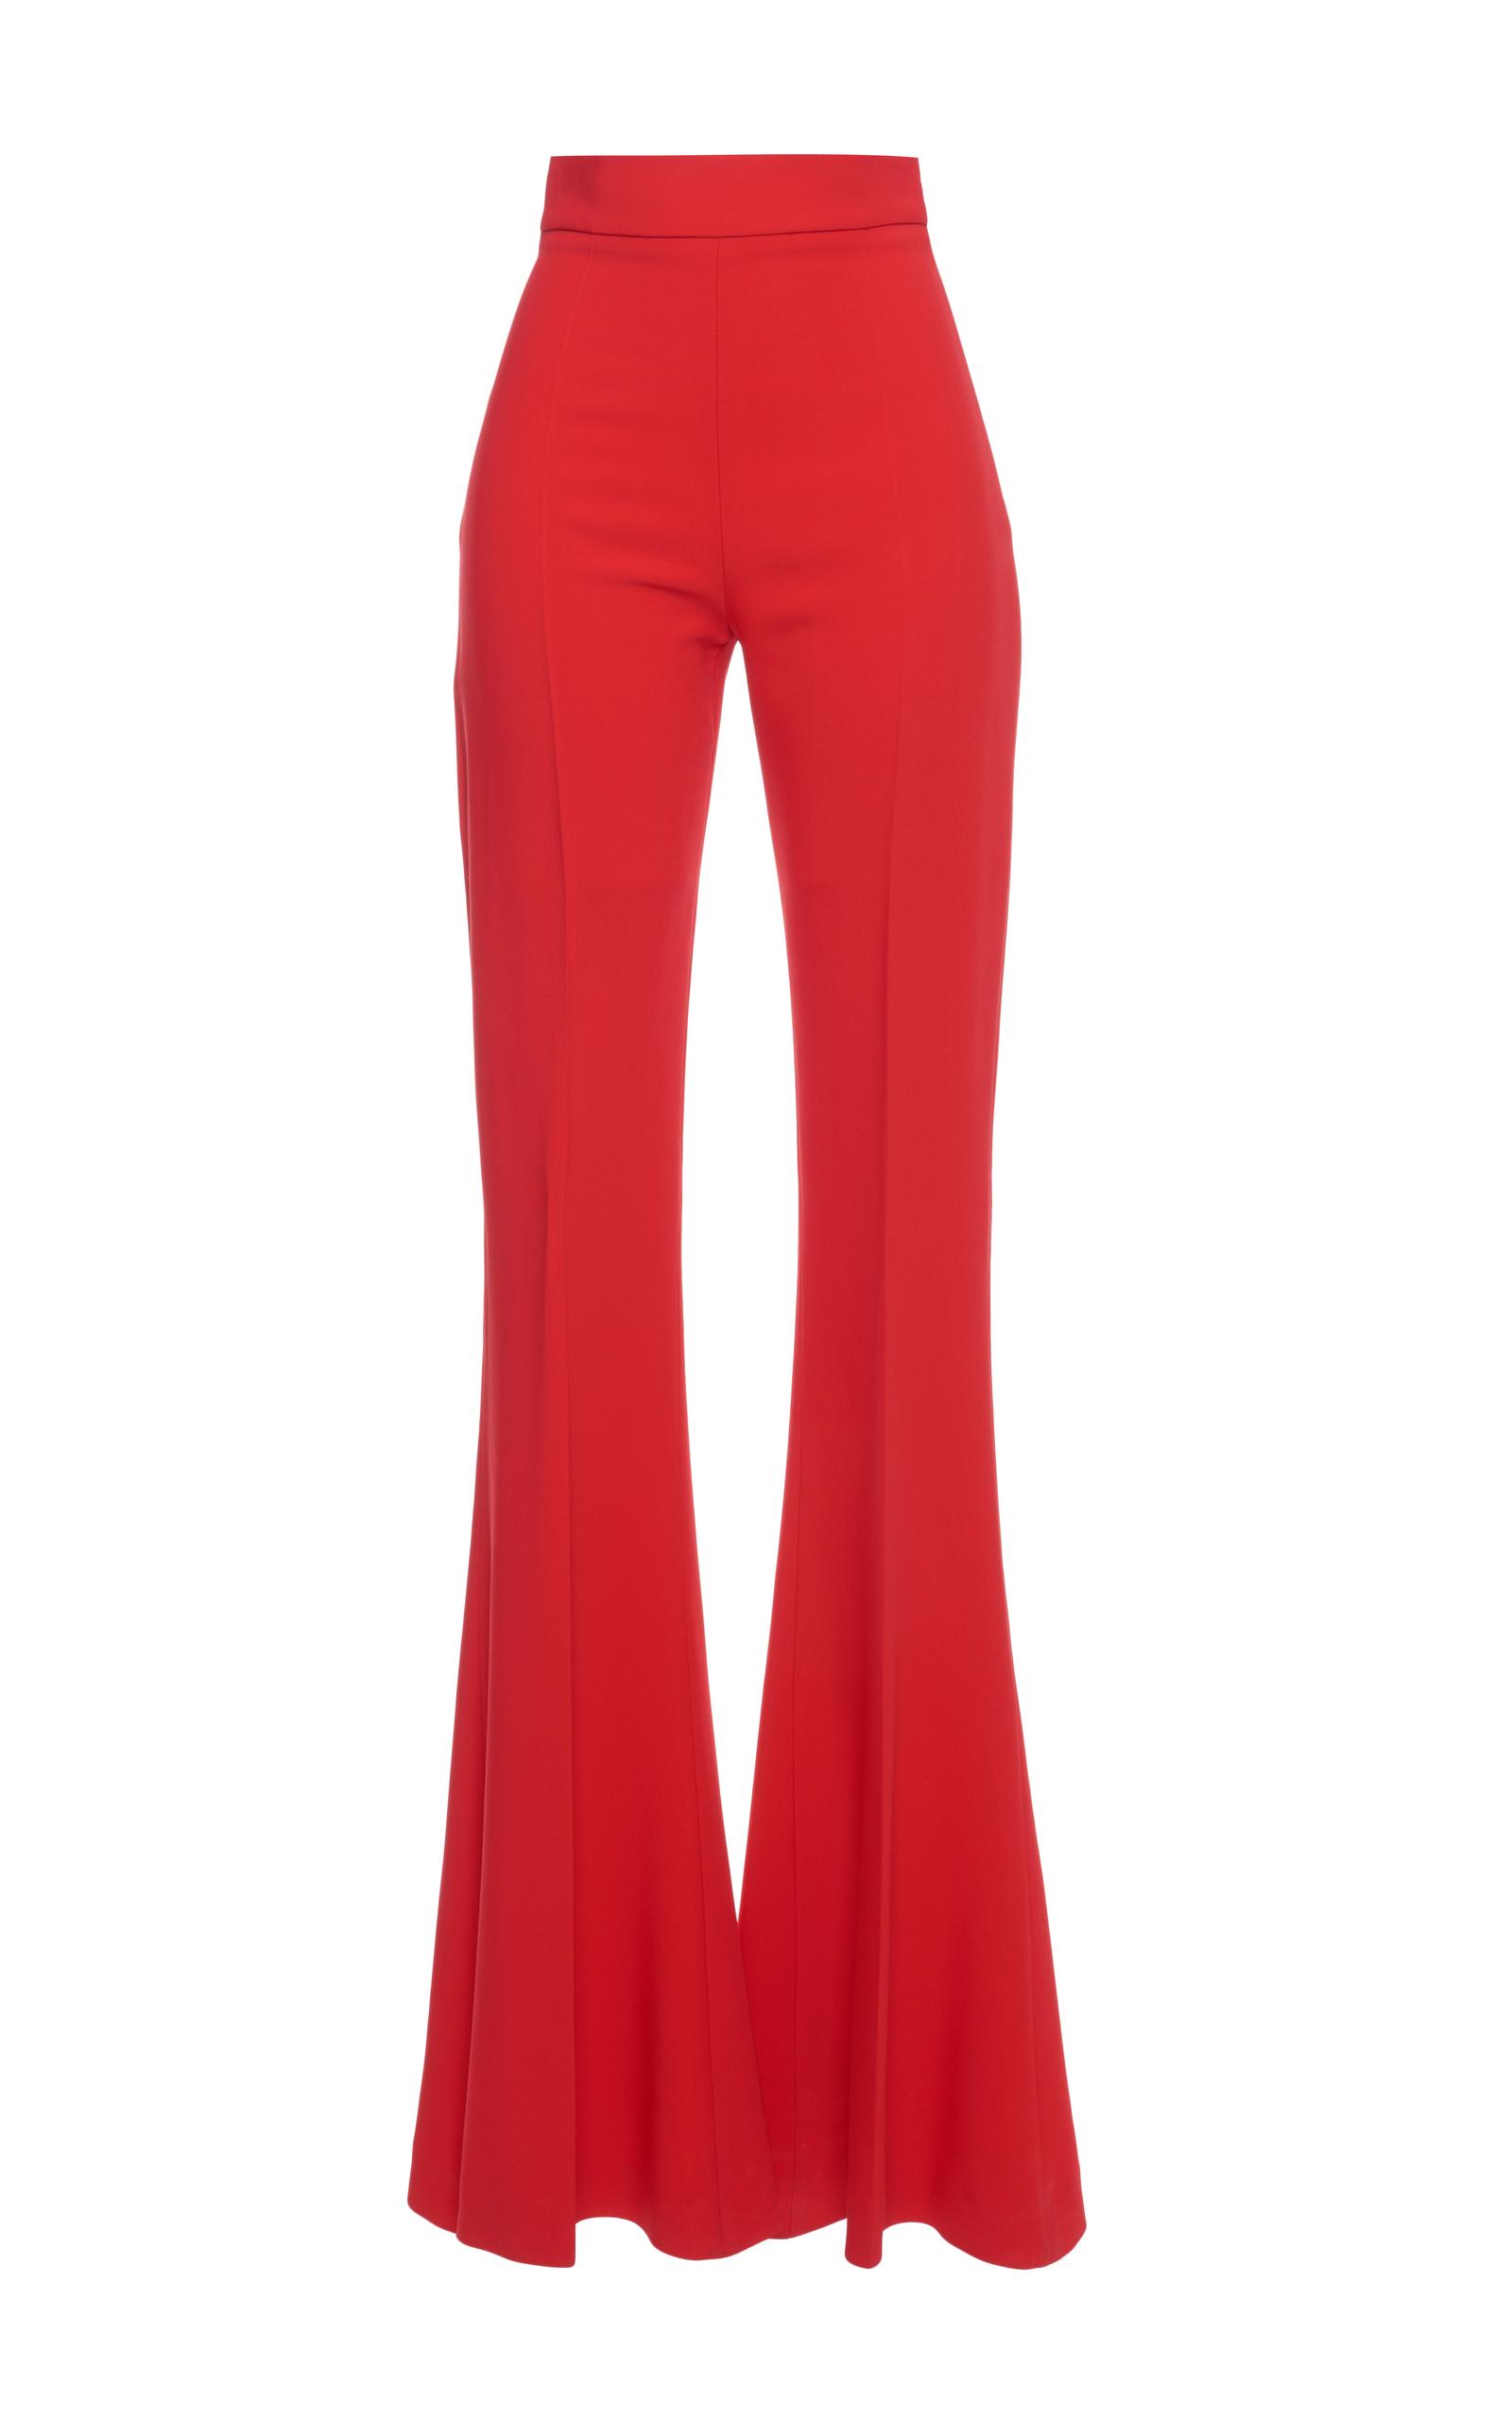 Antonio Berardi high waisted flared trousers Best Selling Cheap Sale Nicekicks 8pW6C7L